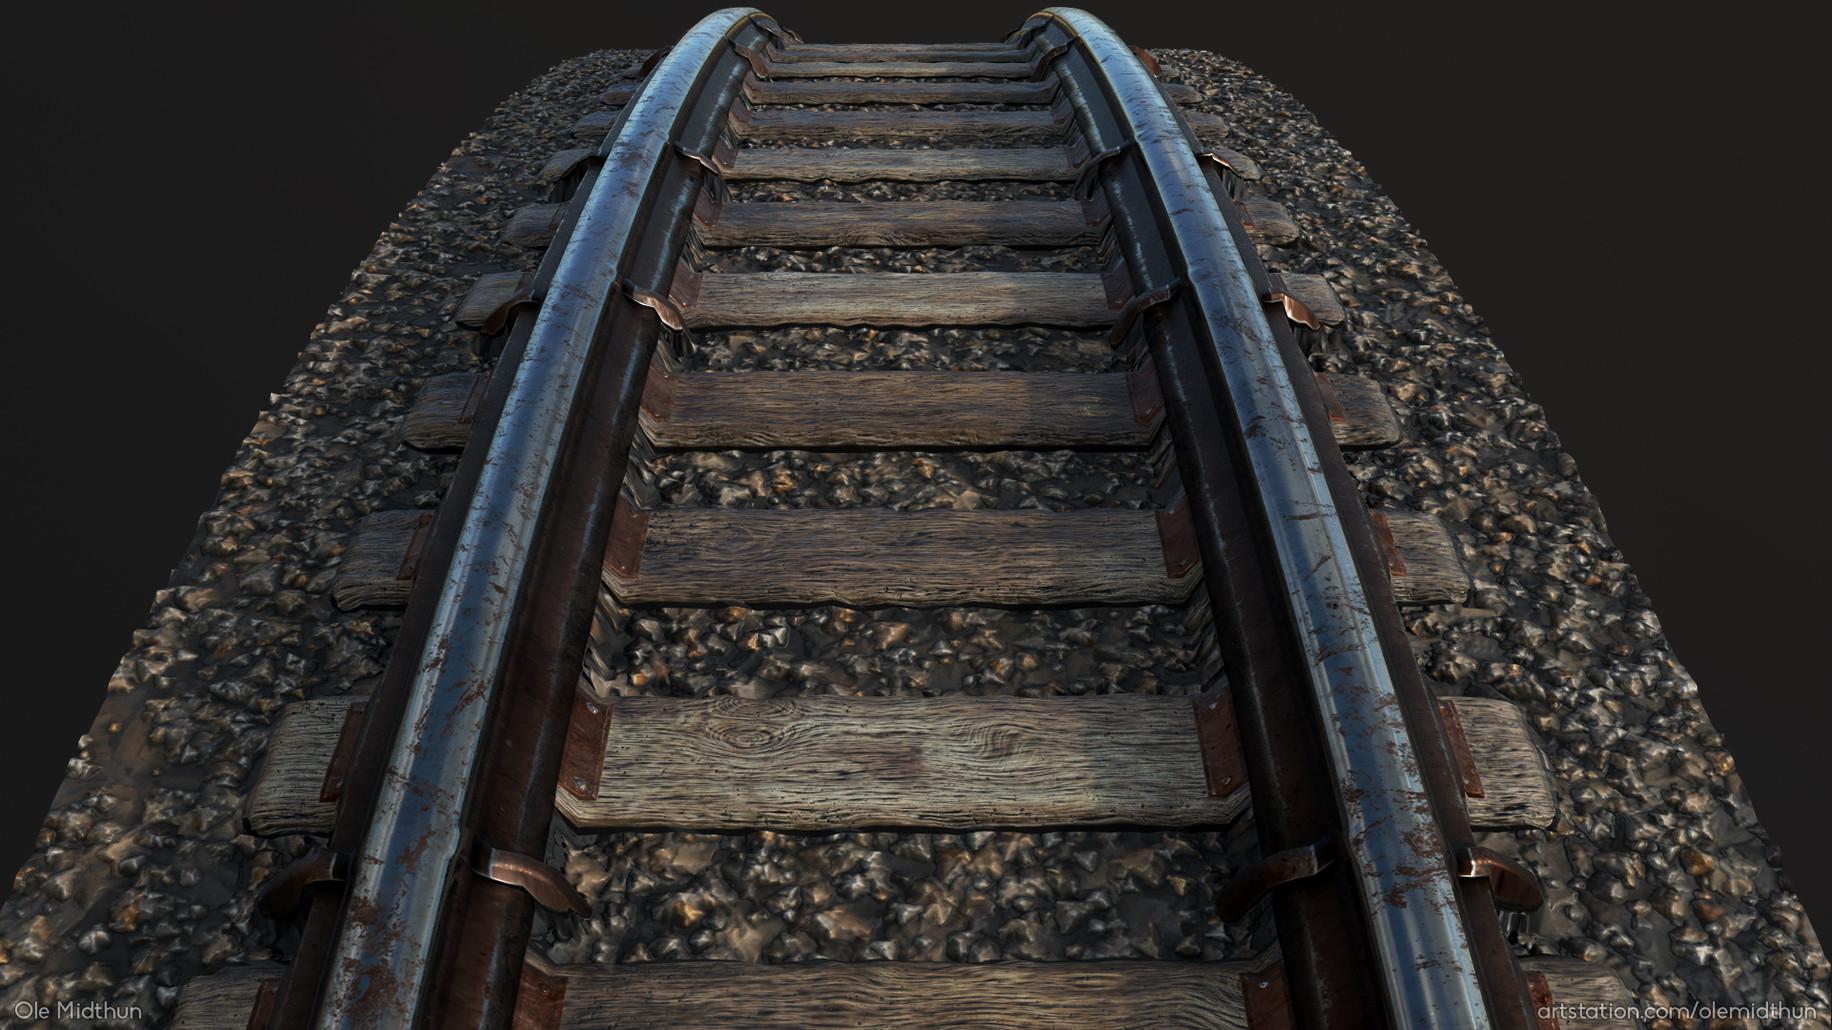 Ole midthun rails render 5